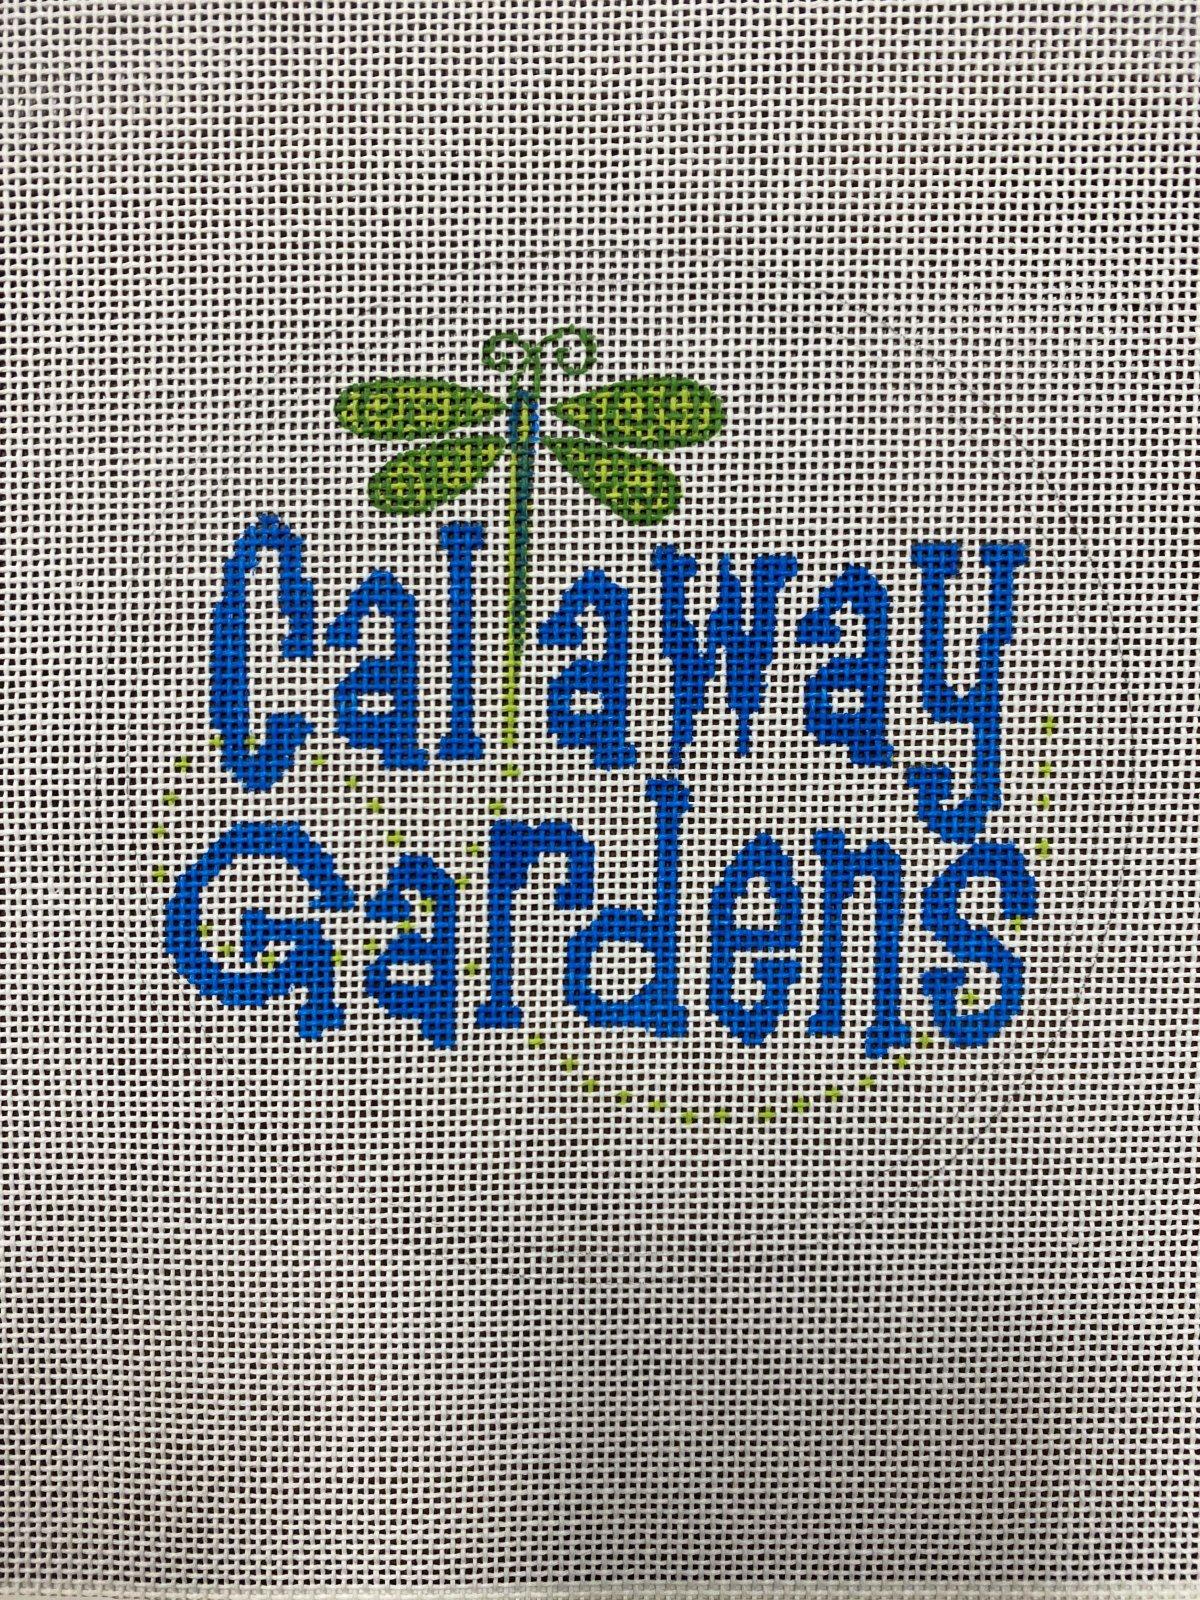 callaway gardens 2014 ornament